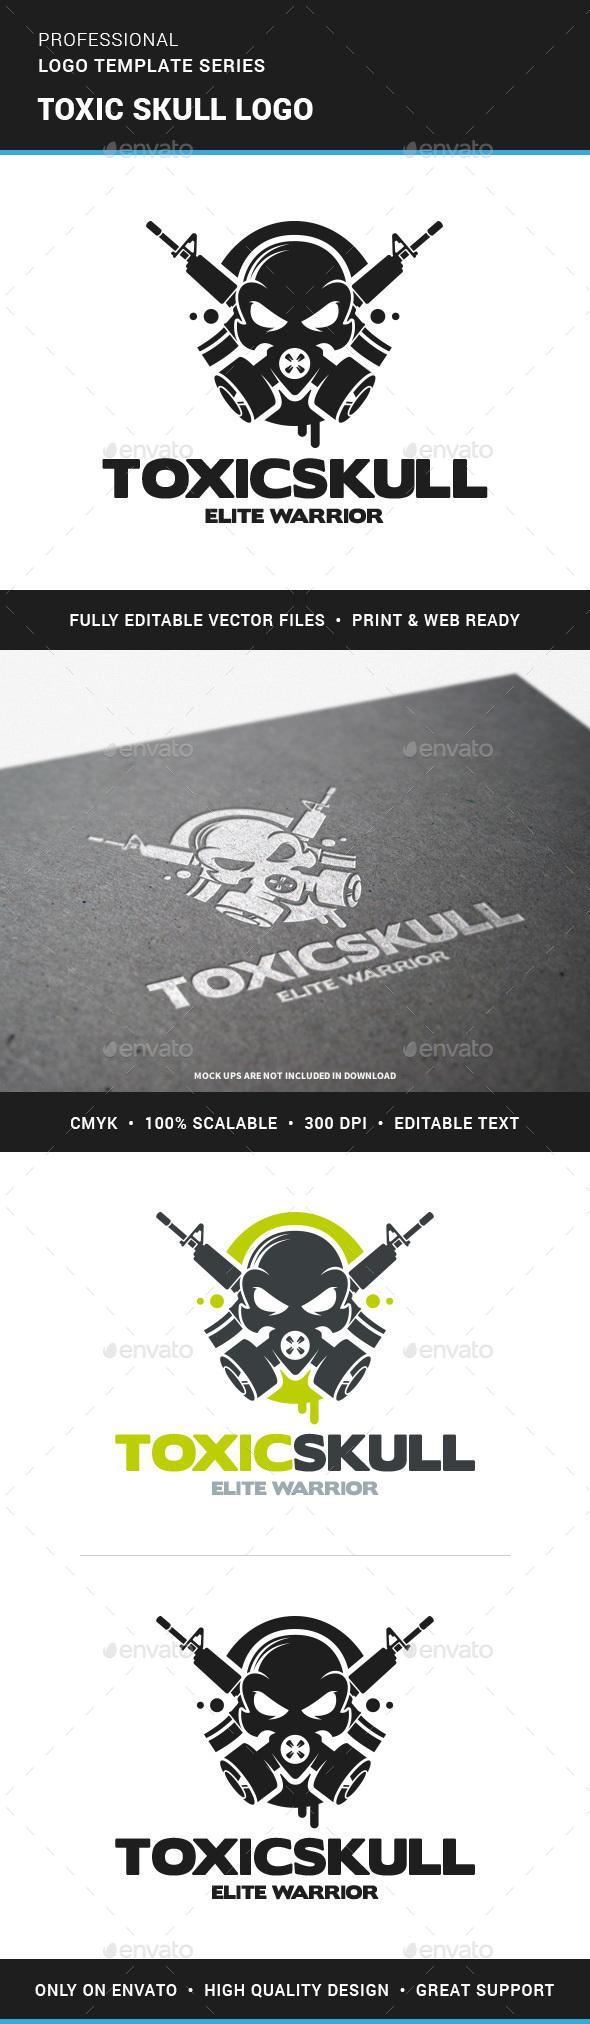 Toxic Skull Logo Template - Logo Templates